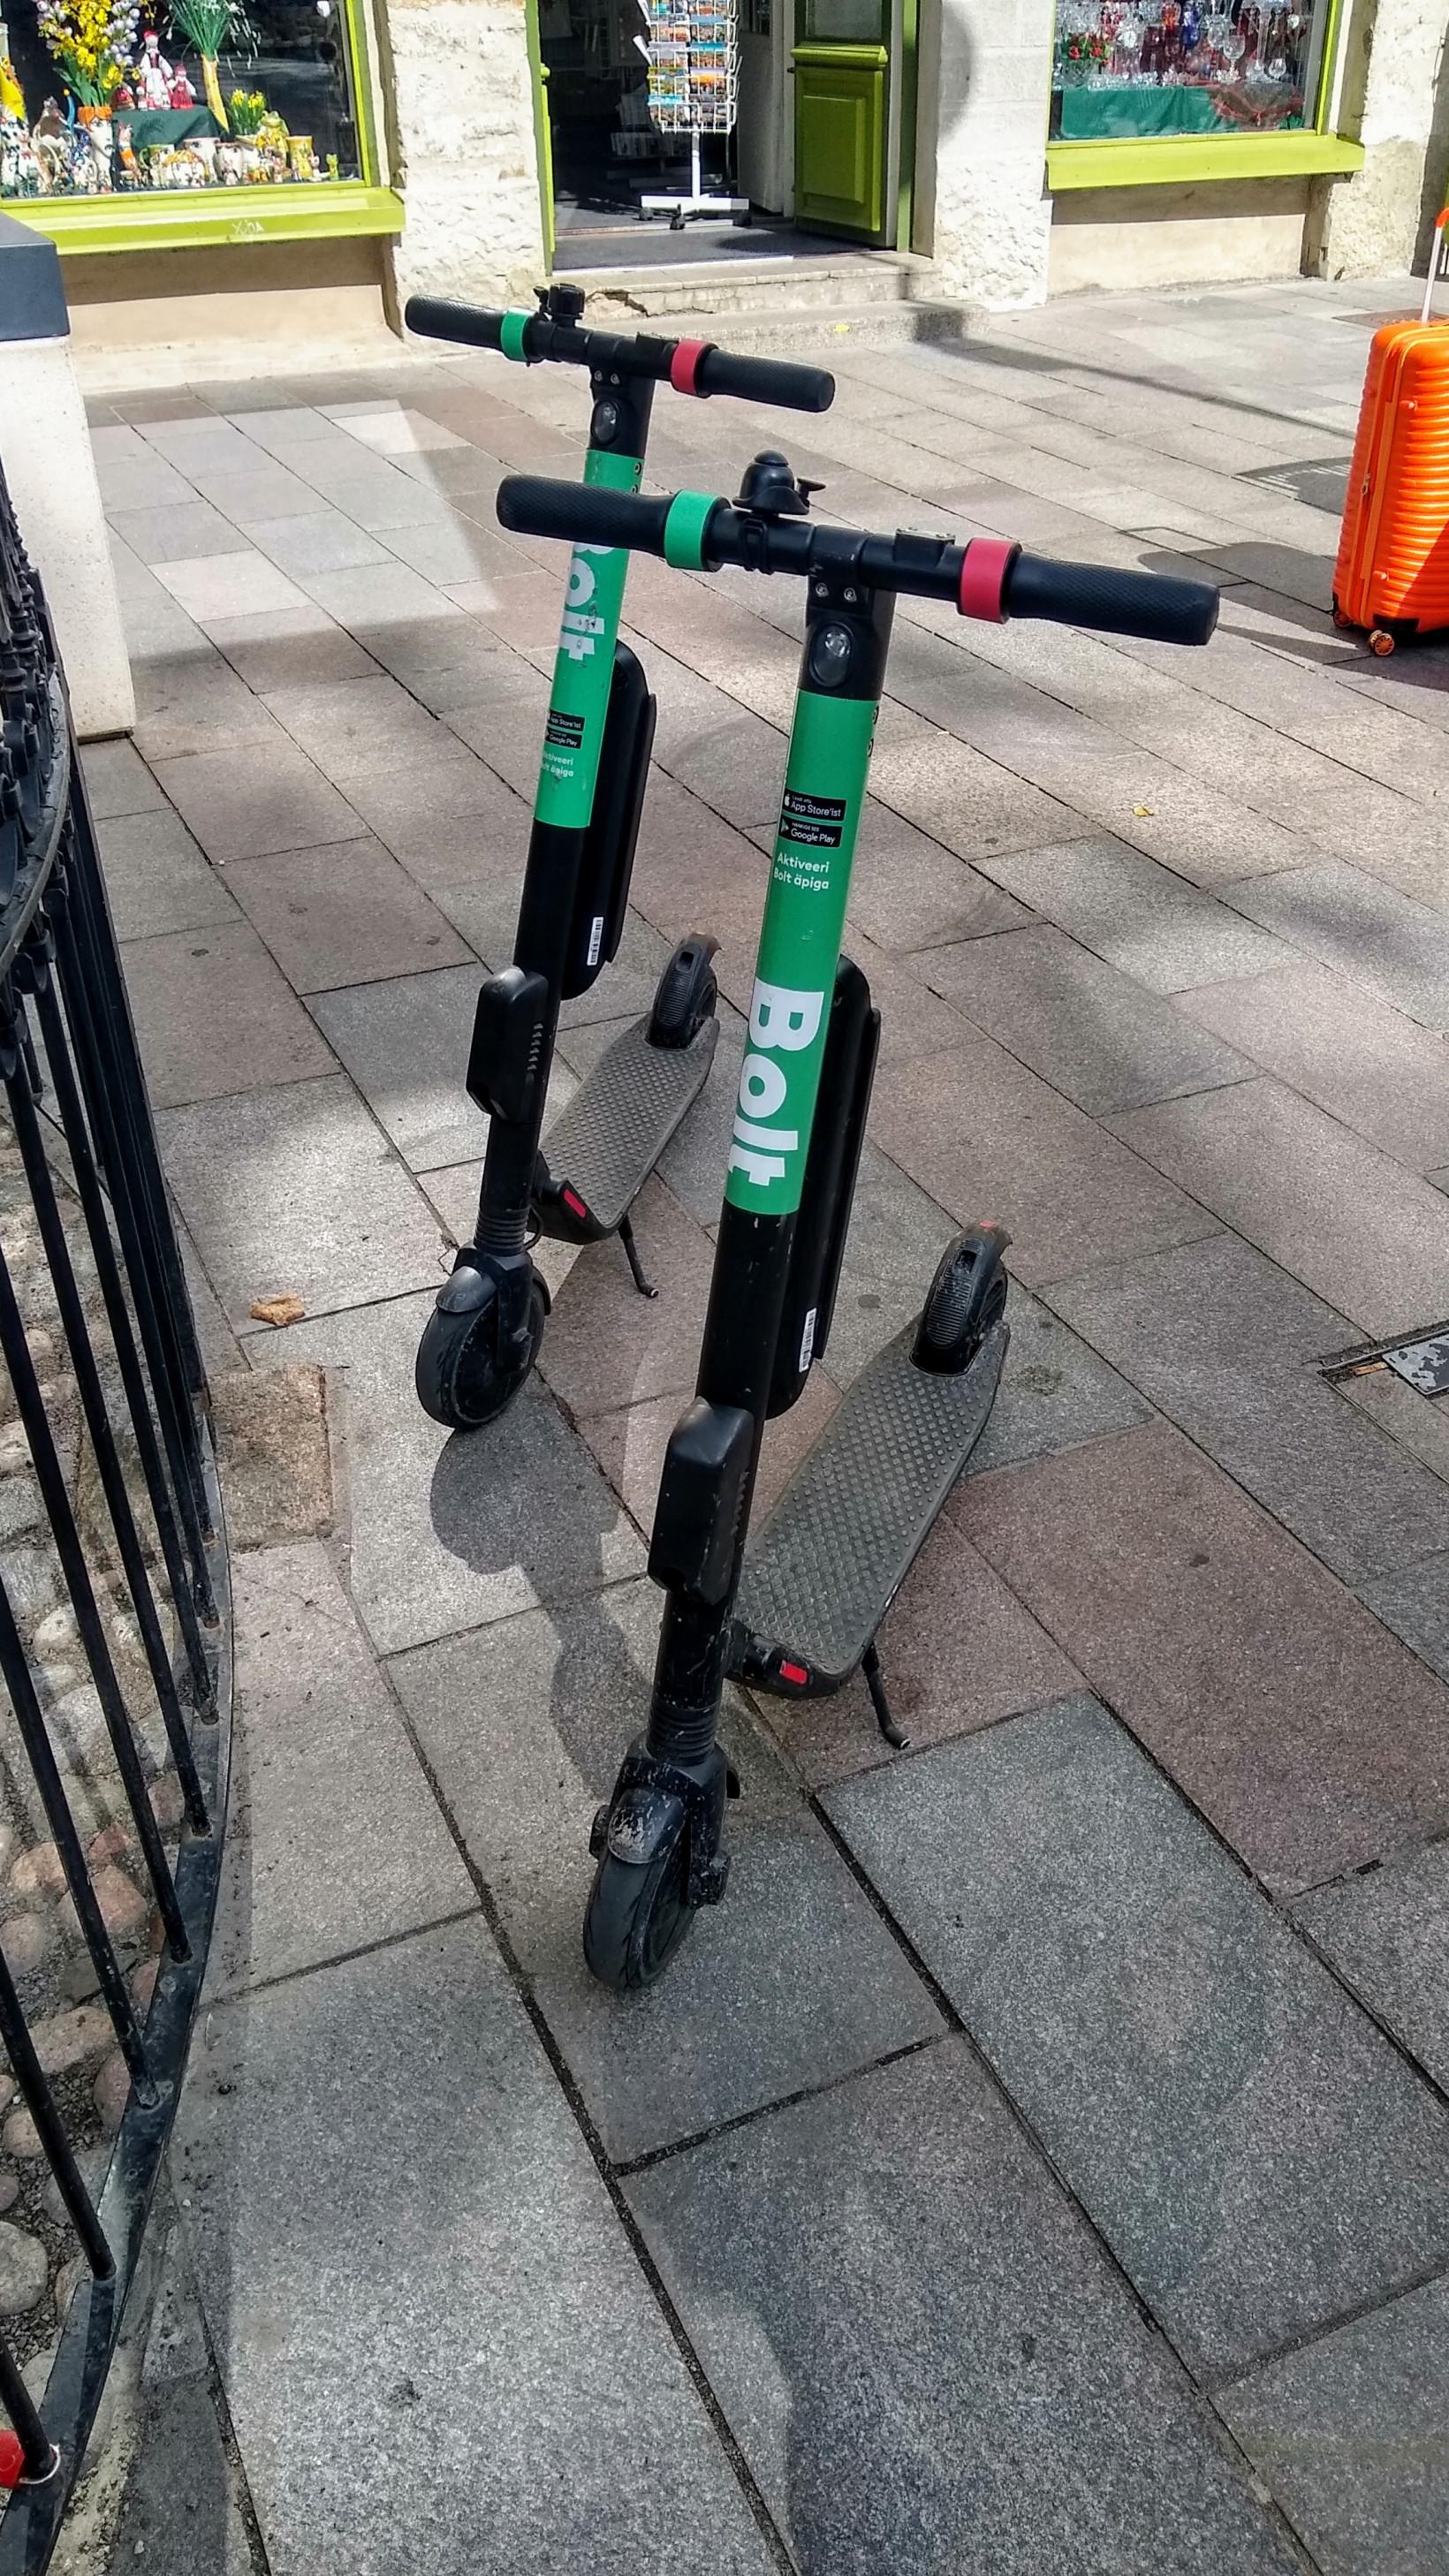 estonia, bolt, scooter, e-scooter, regulations, laws